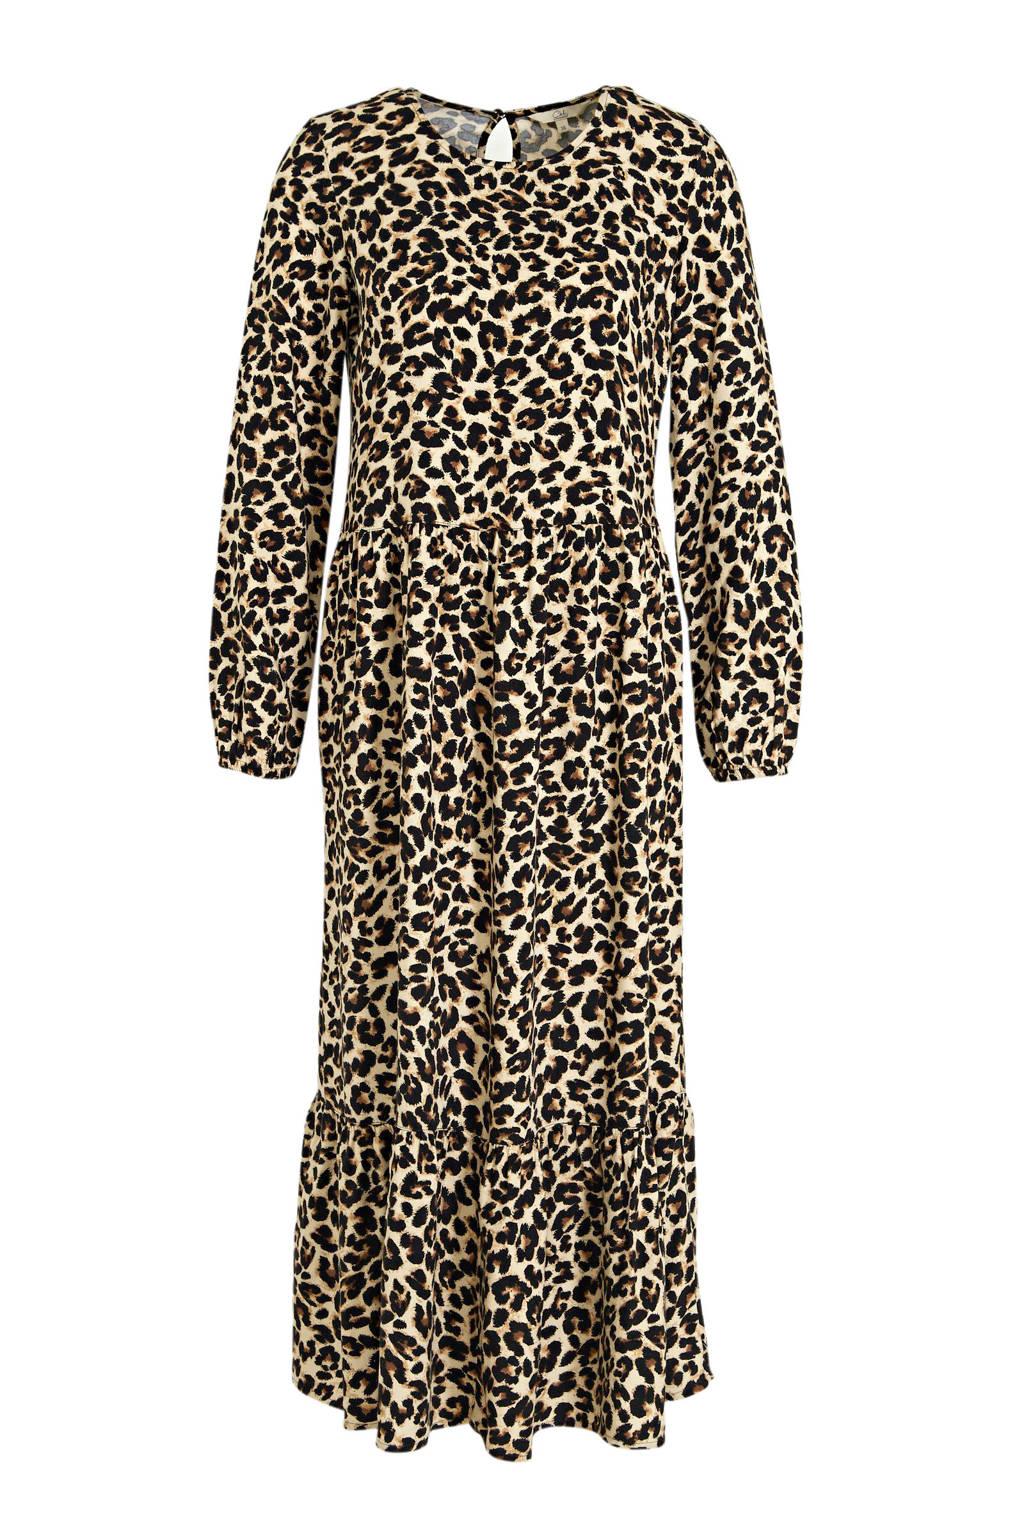 C&A Clockhouse maxi jurk met panterprint en open detail beige/bruin/zwart, Beige/bruin/zwart